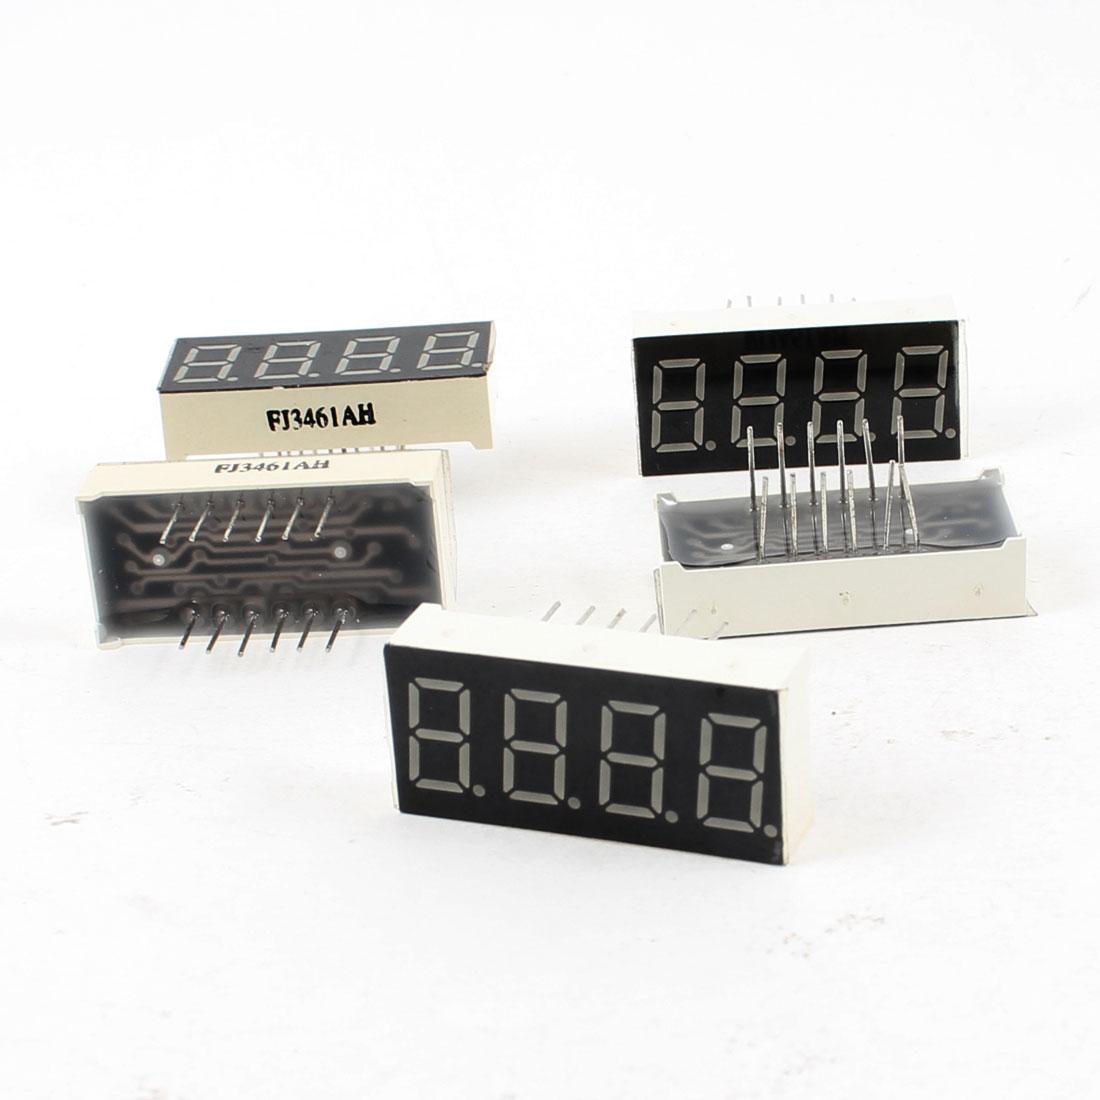 "5 Pcs Common Cathode 12 Terminals 4 Bit 7 Segment 0.36"" Red LED Display Digital Tube"